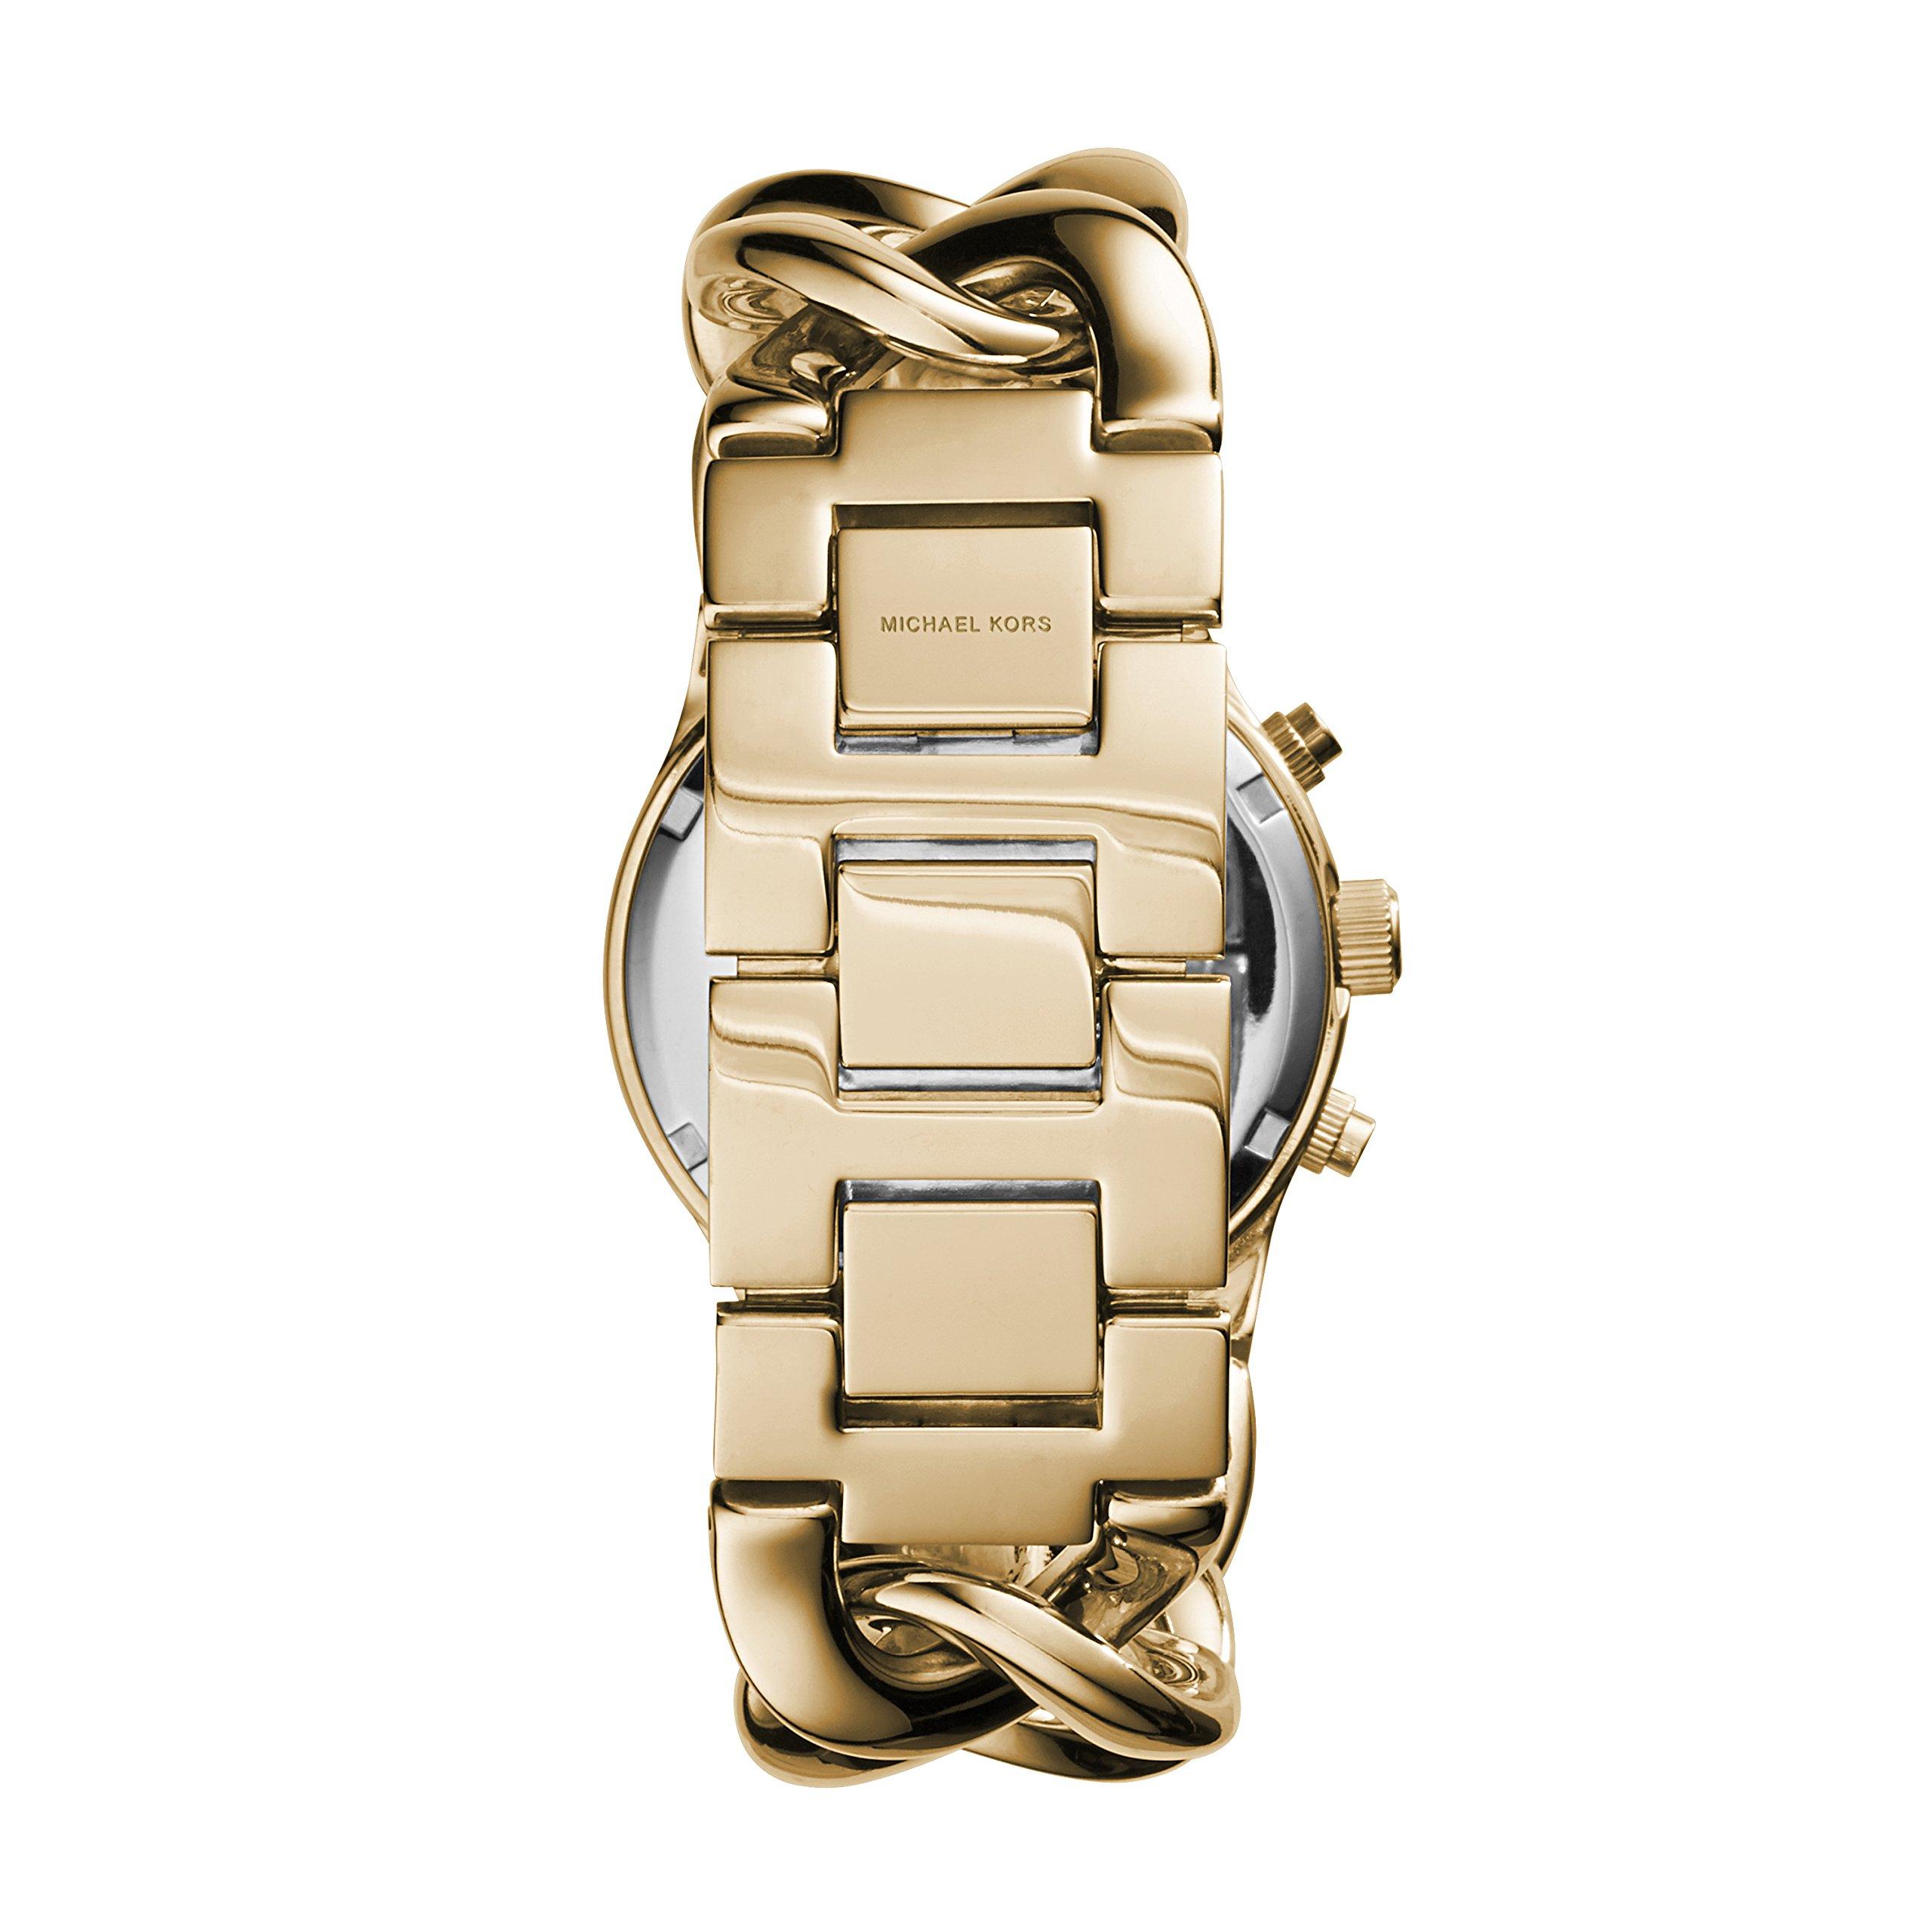 Michael Kors Women's Runway Gold-Tone Watch MK3131 by Michael Kors (Image #3)